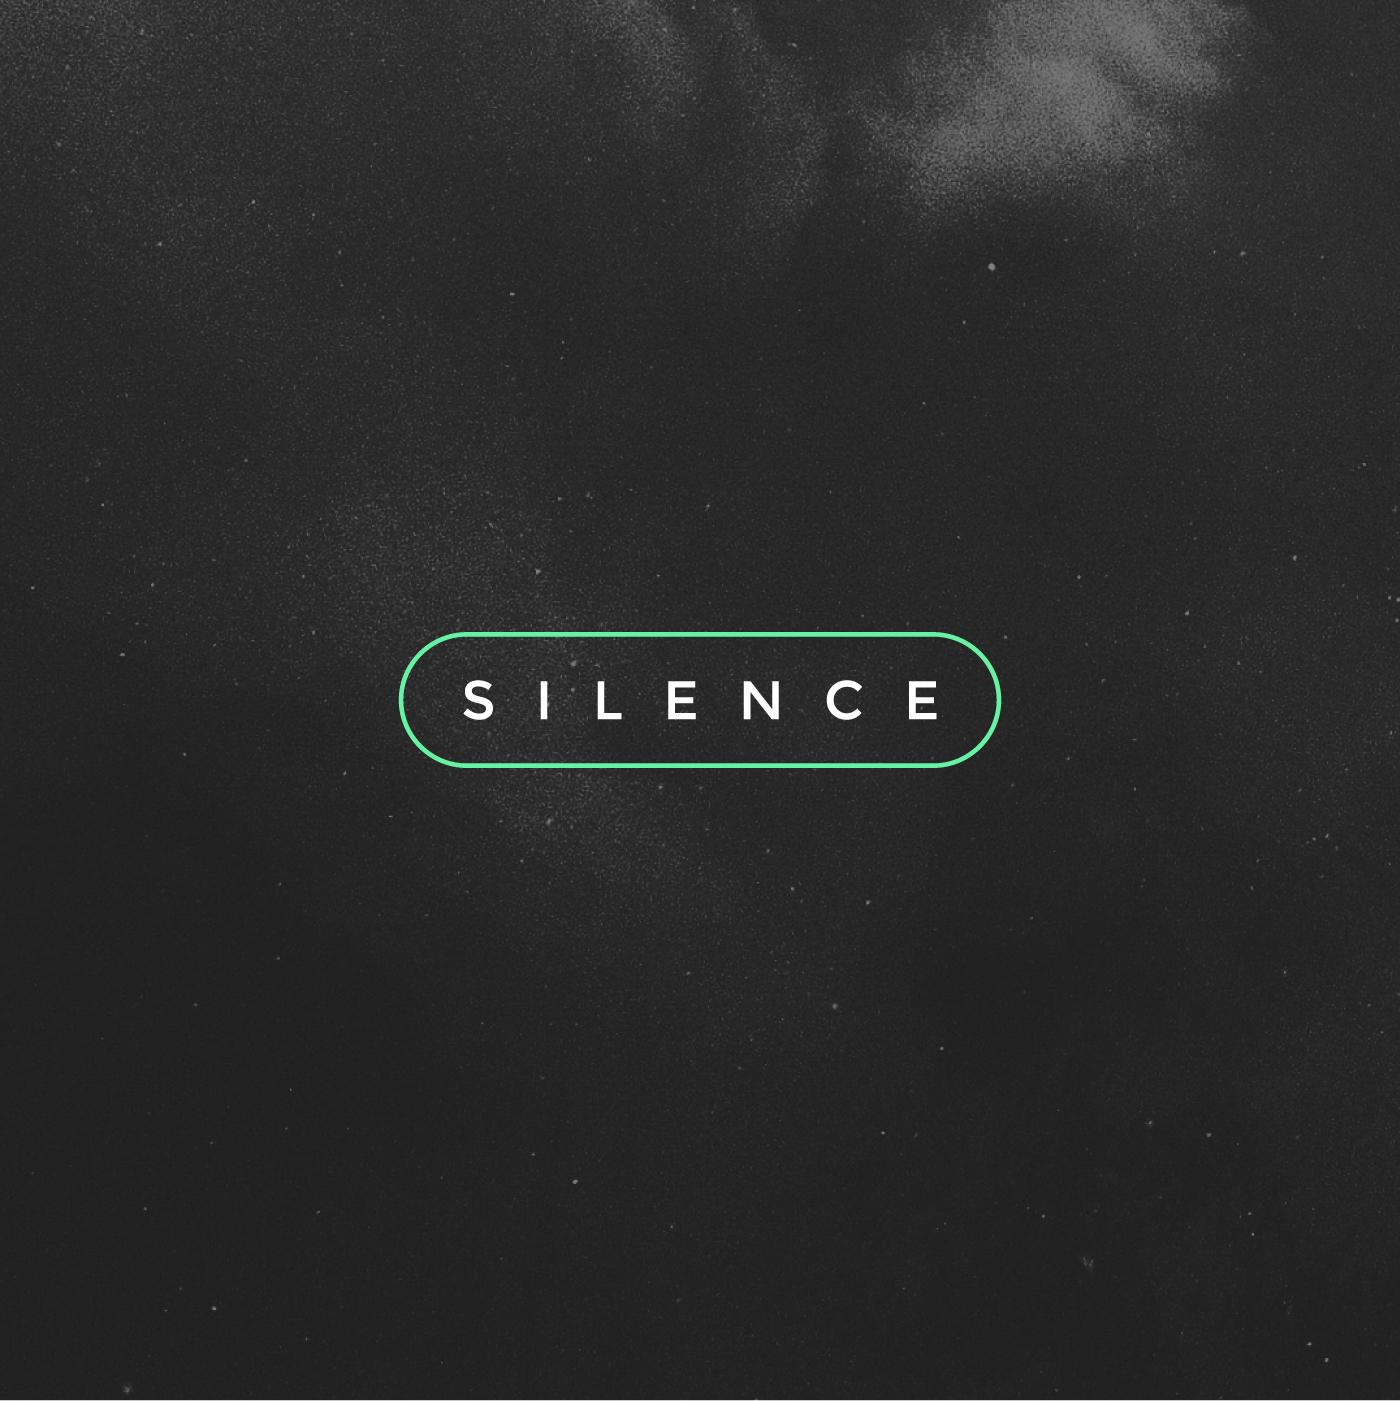 122435_SilenceGraphic_Ig_091217.jpg